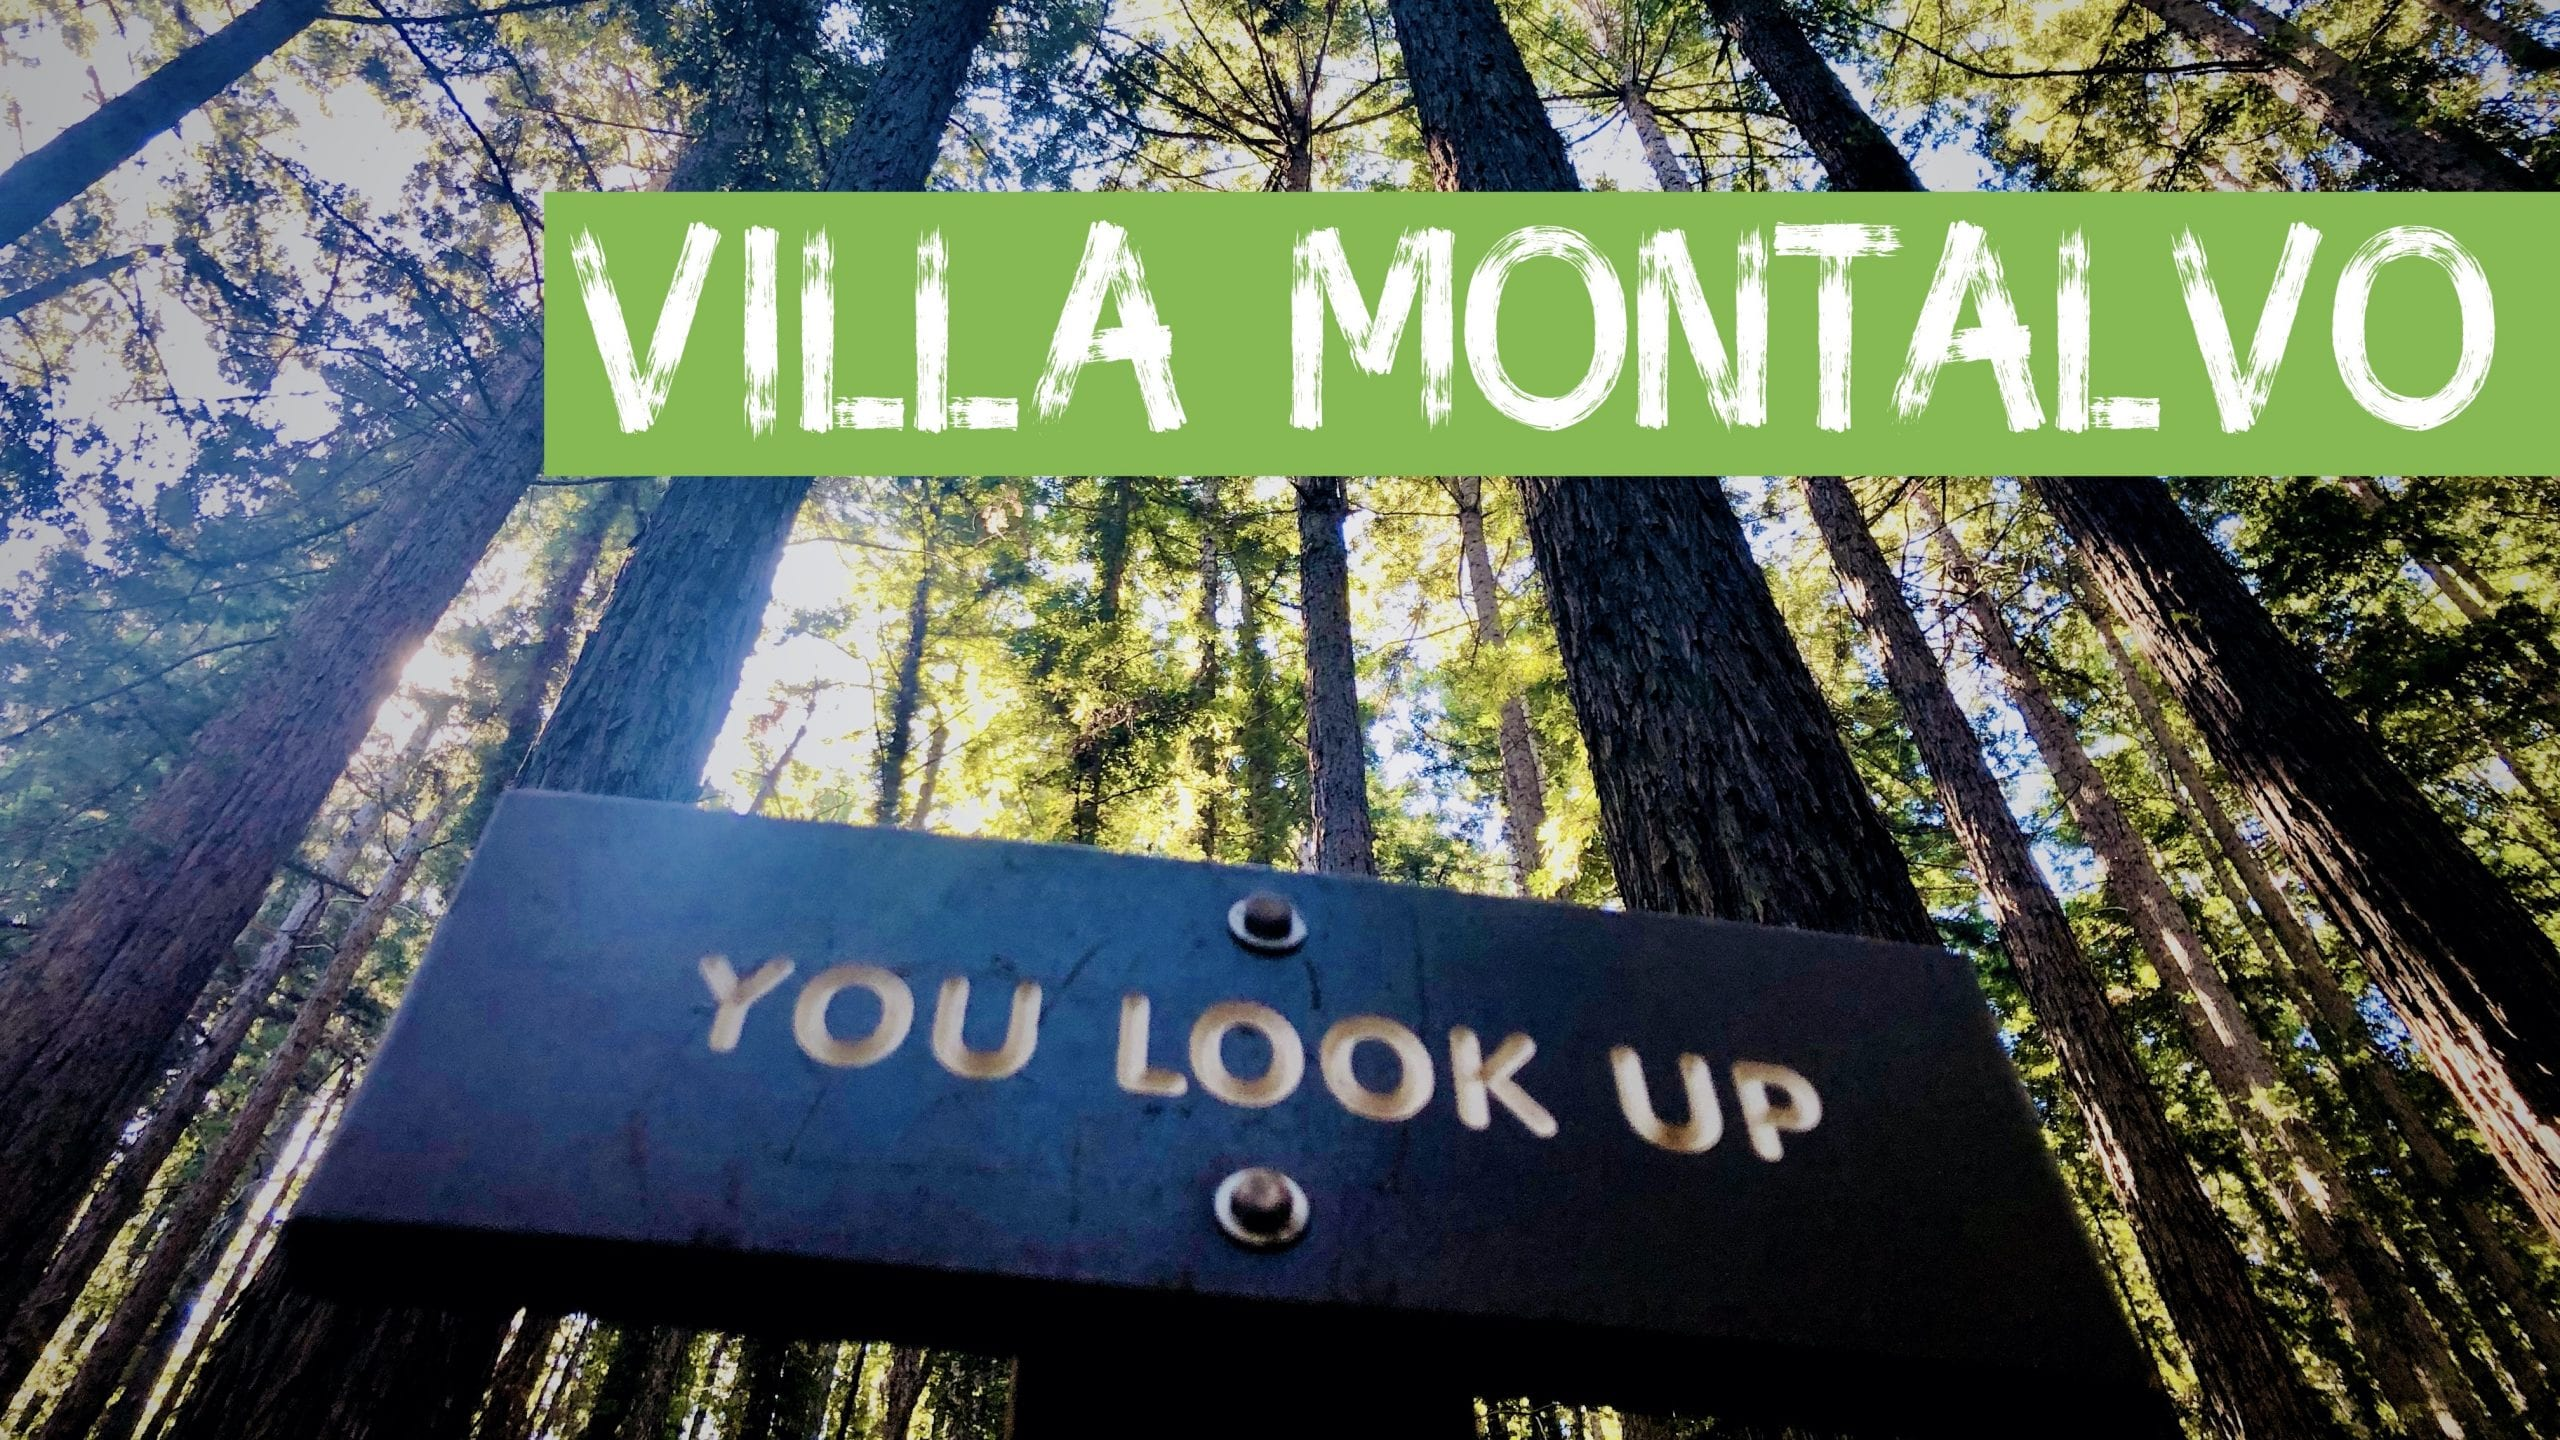 Redwood Tree Cover for Villa Montalvo YouTube Link